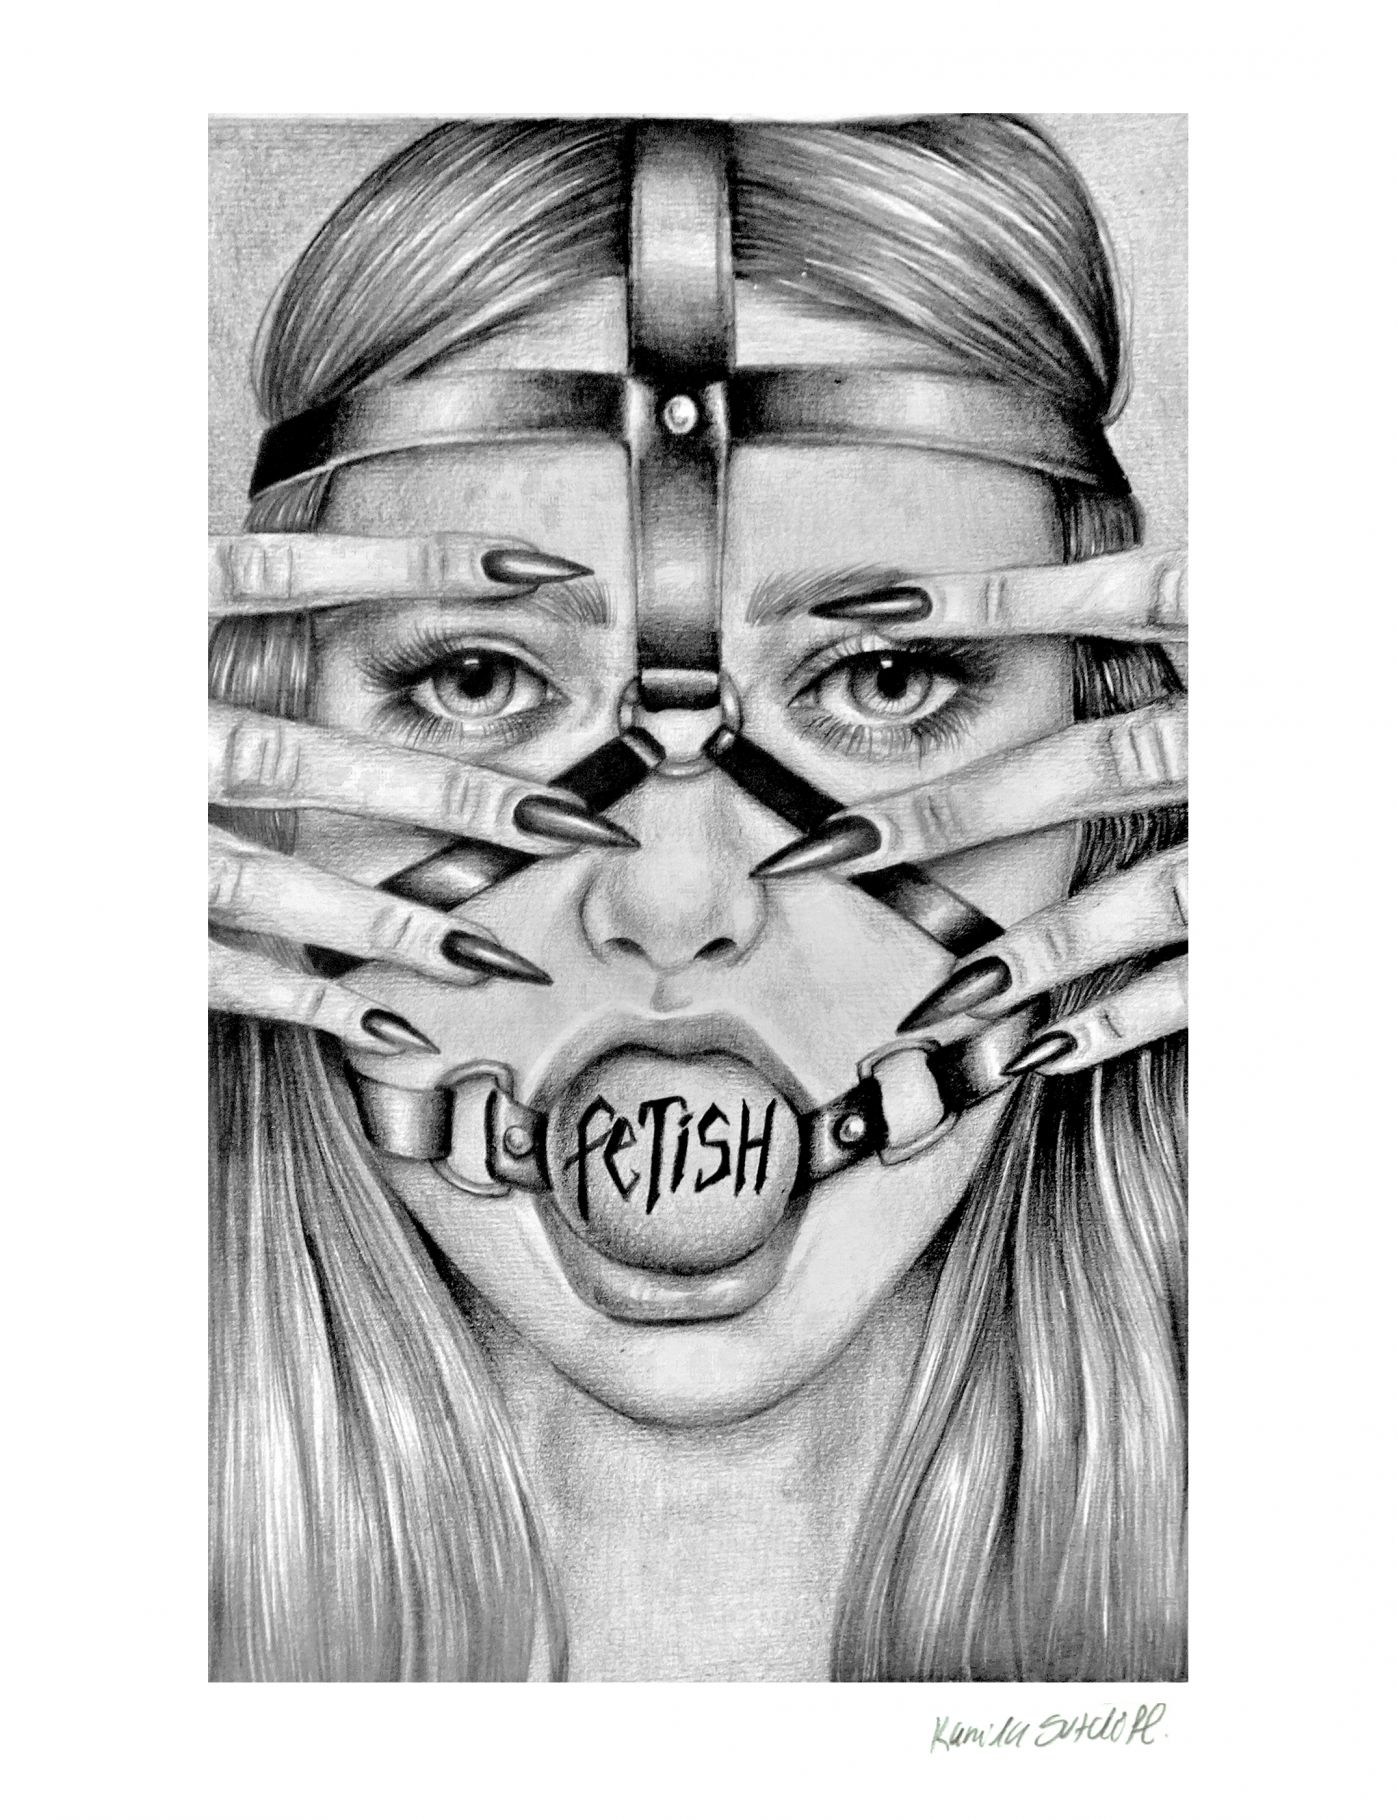 fetish (2018) - Kamila Sutcliff